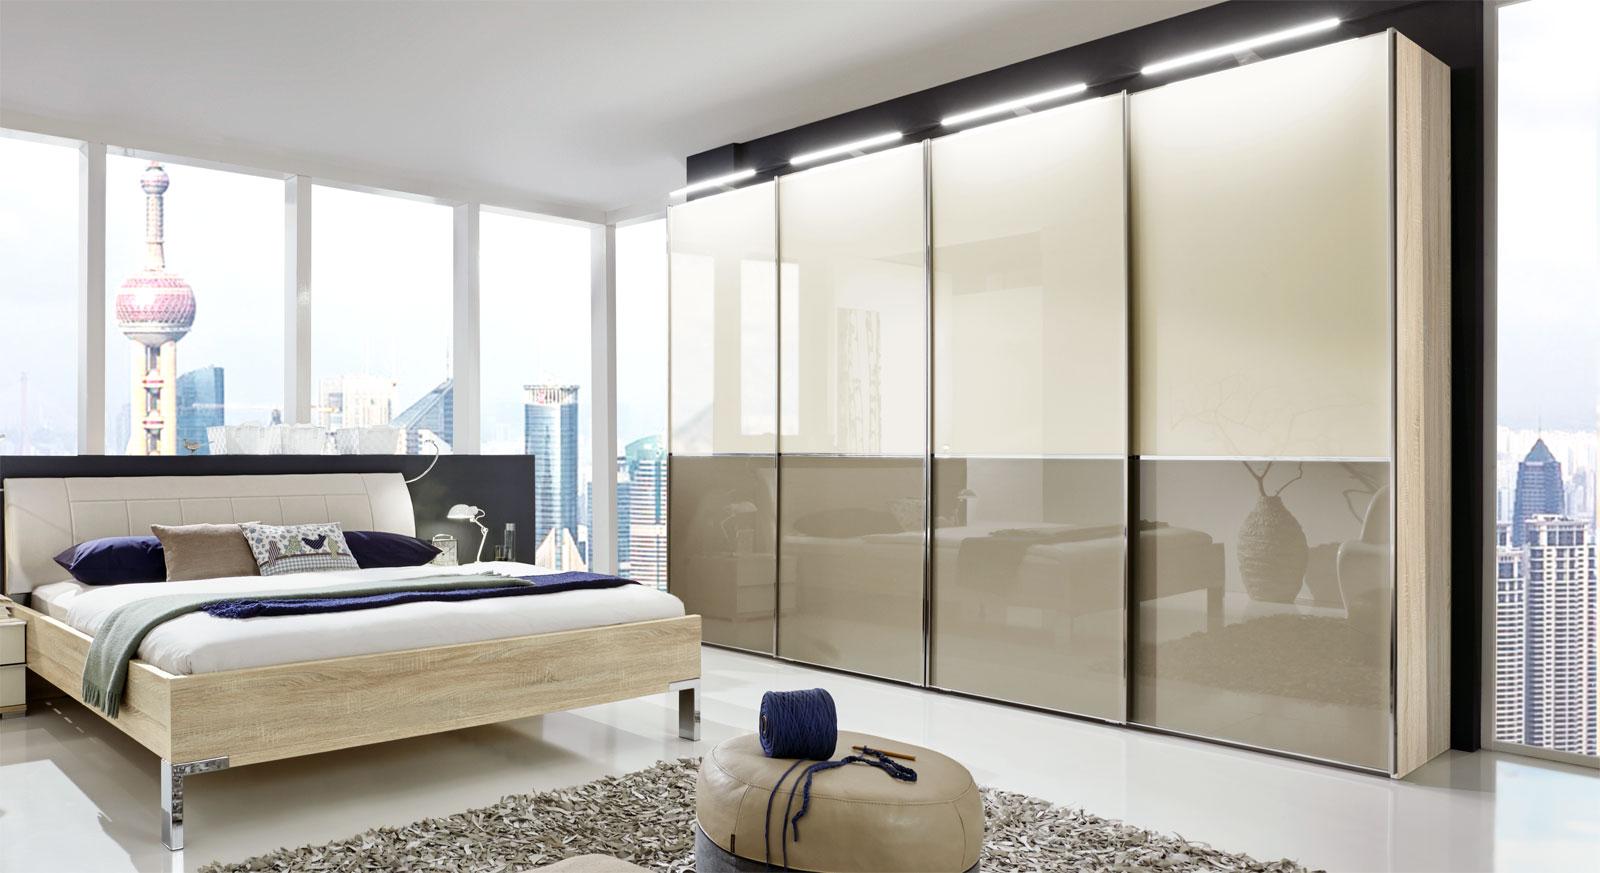 schwebeturenschrank design, schwebetürenschrank in dekor mit glasfront 2 bis 4 türig - banga, Design ideen